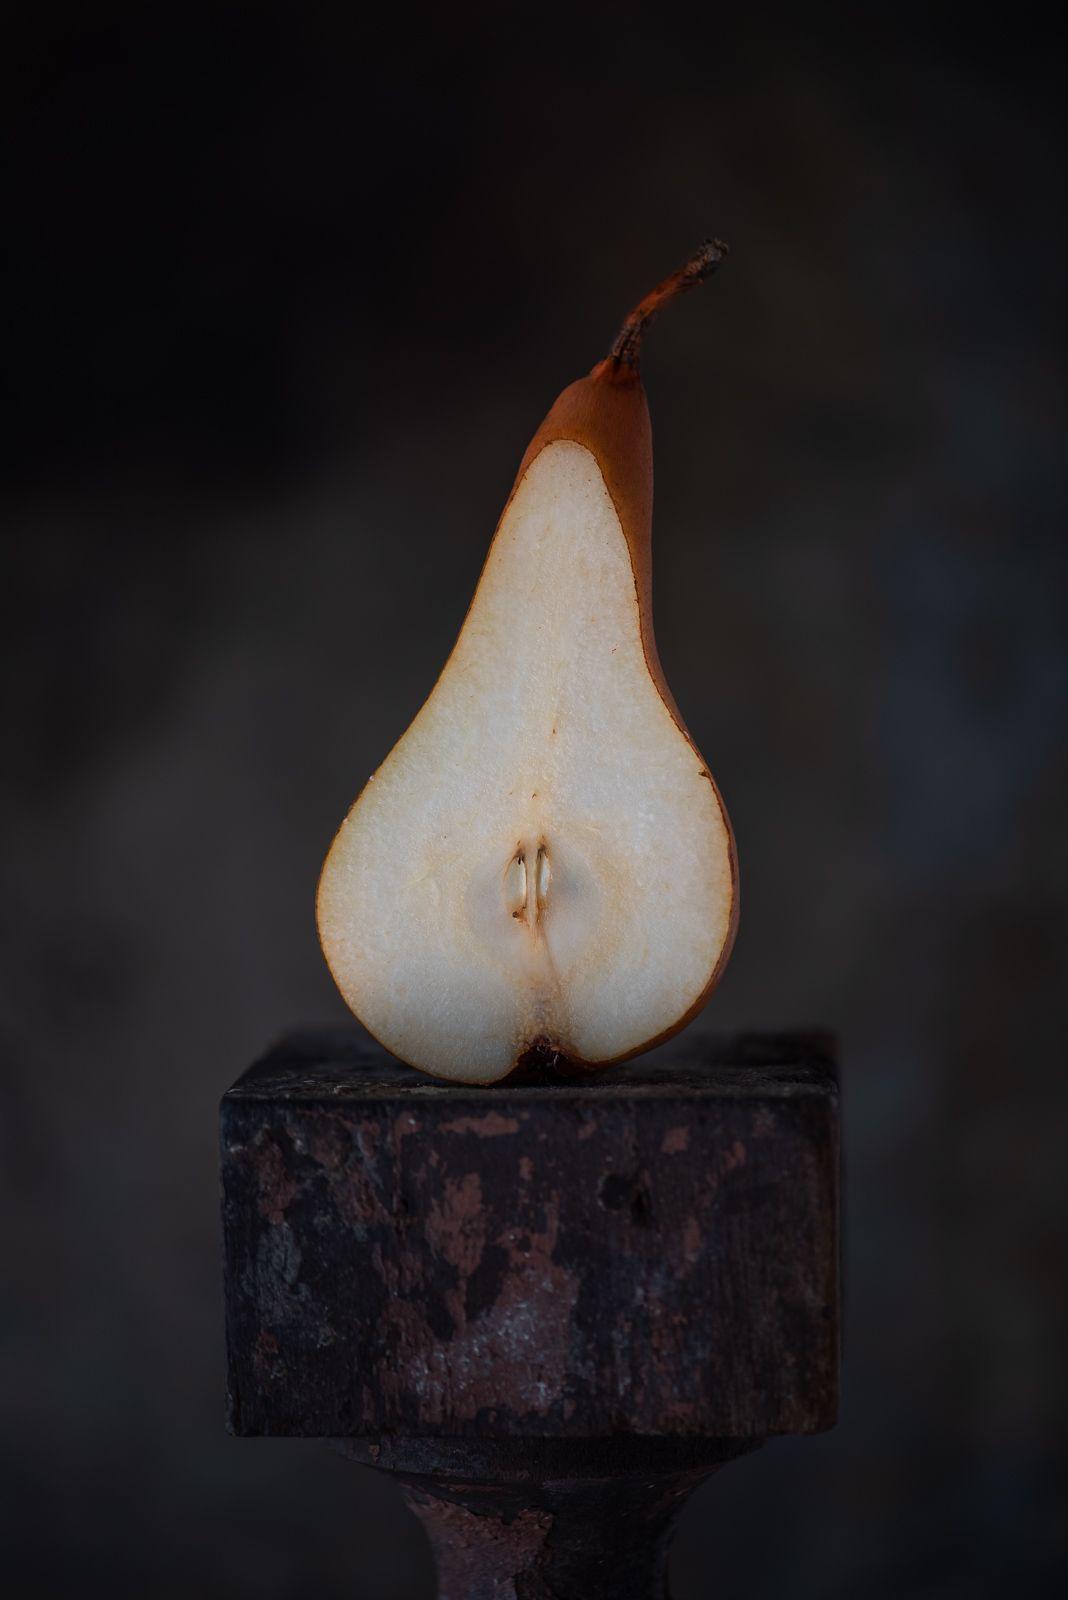 Lynn Karlin_Ripe Pear.jpg